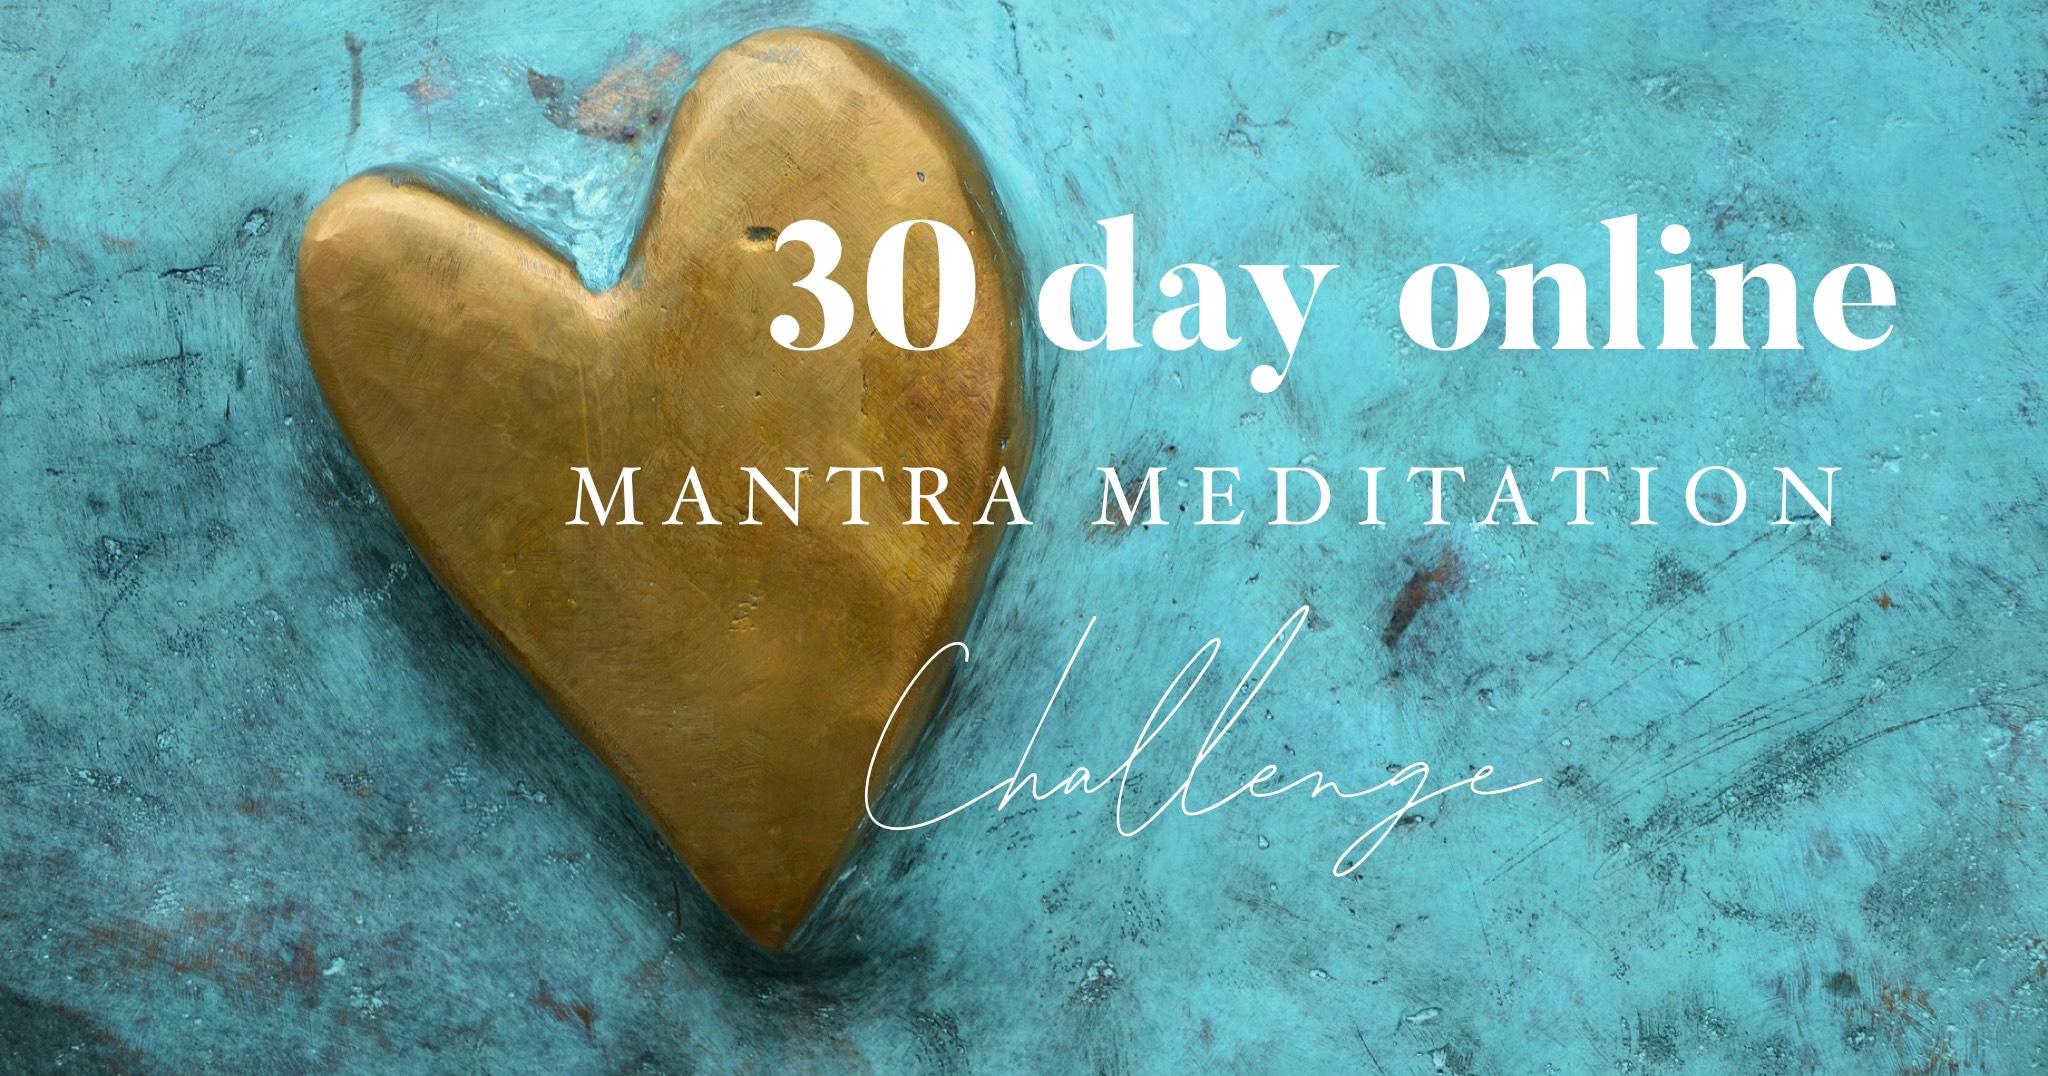 Mantra Meditation Challenge